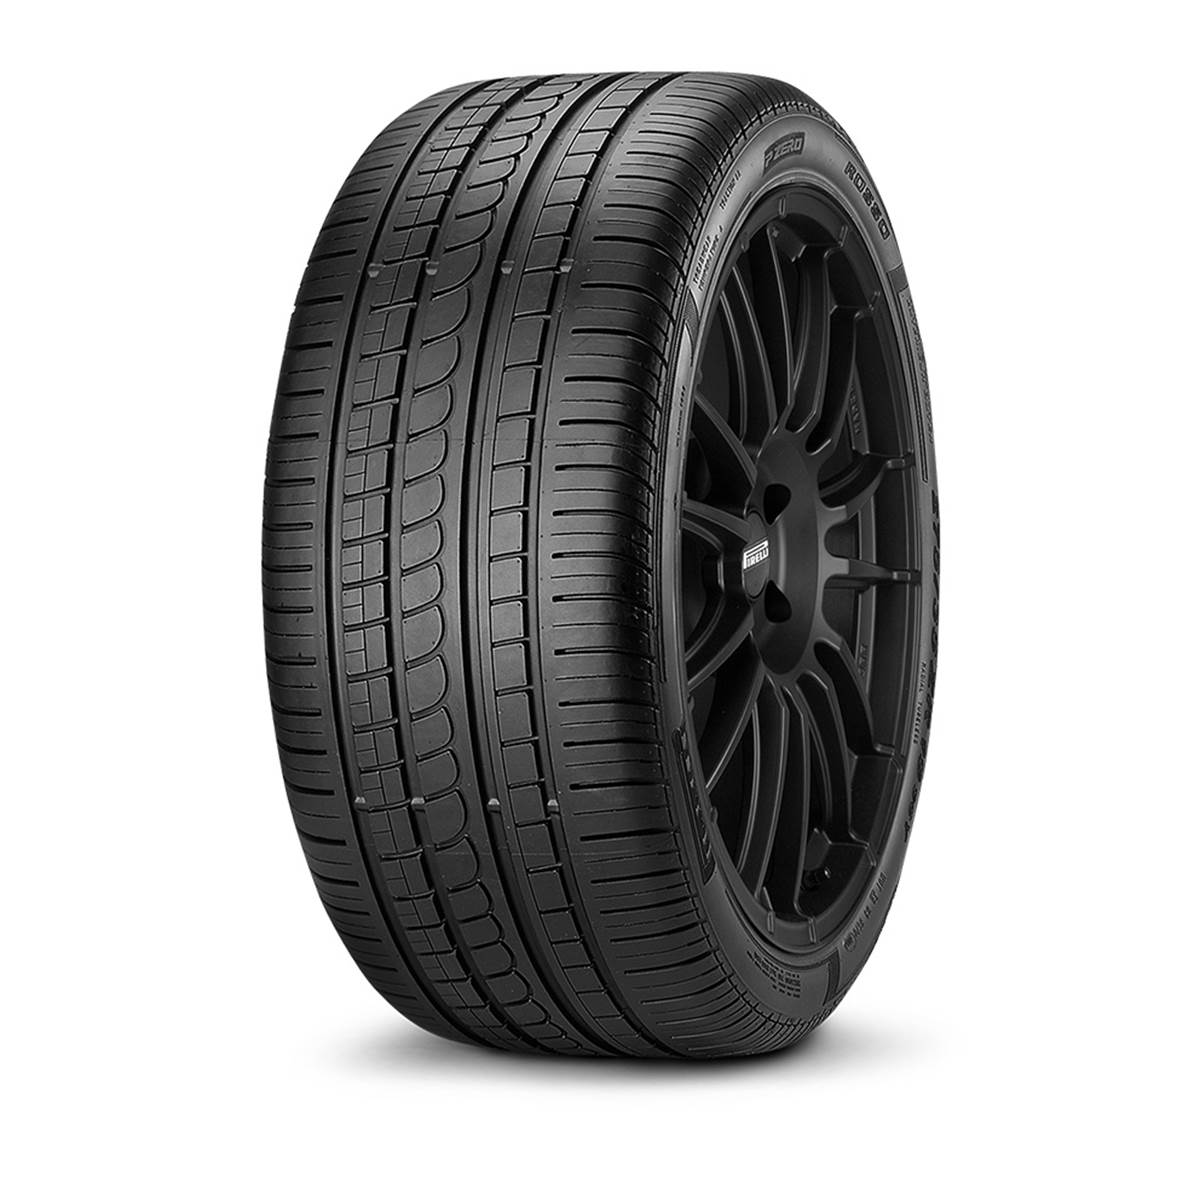 Pneu Pirelli 235/35R19 91Y Pzero Nero Gt XL